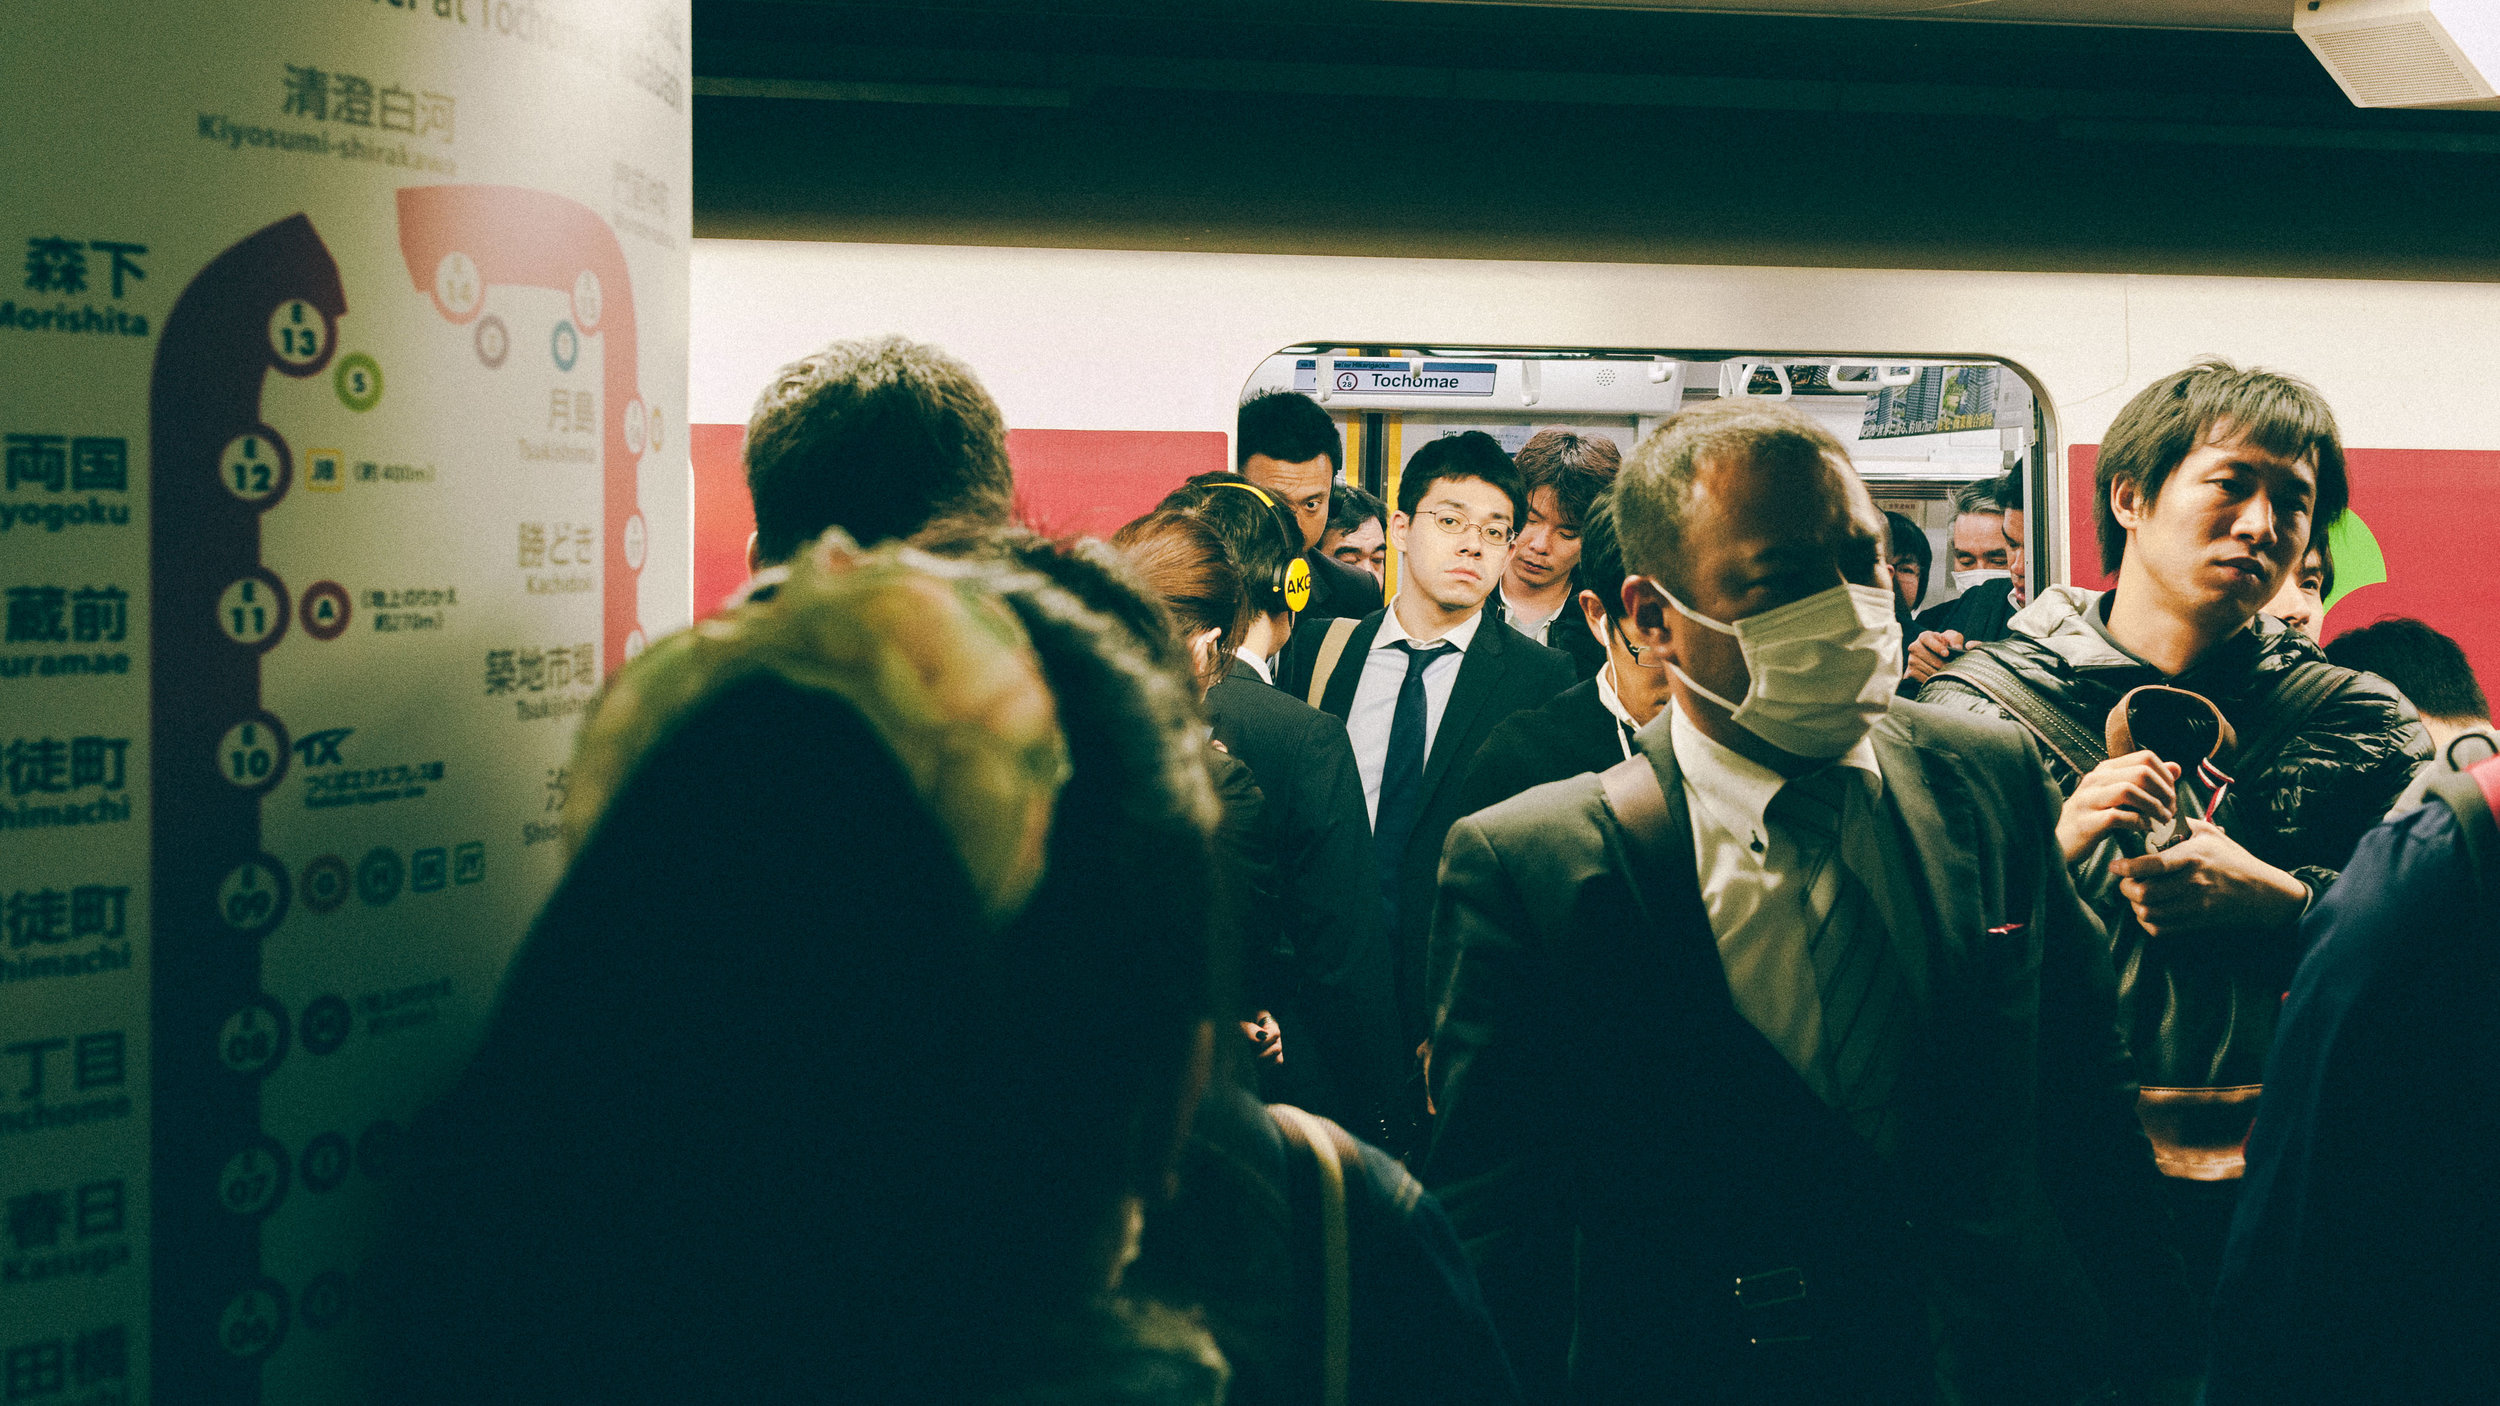 tokyo-metro-street-photographyjpg.jpg